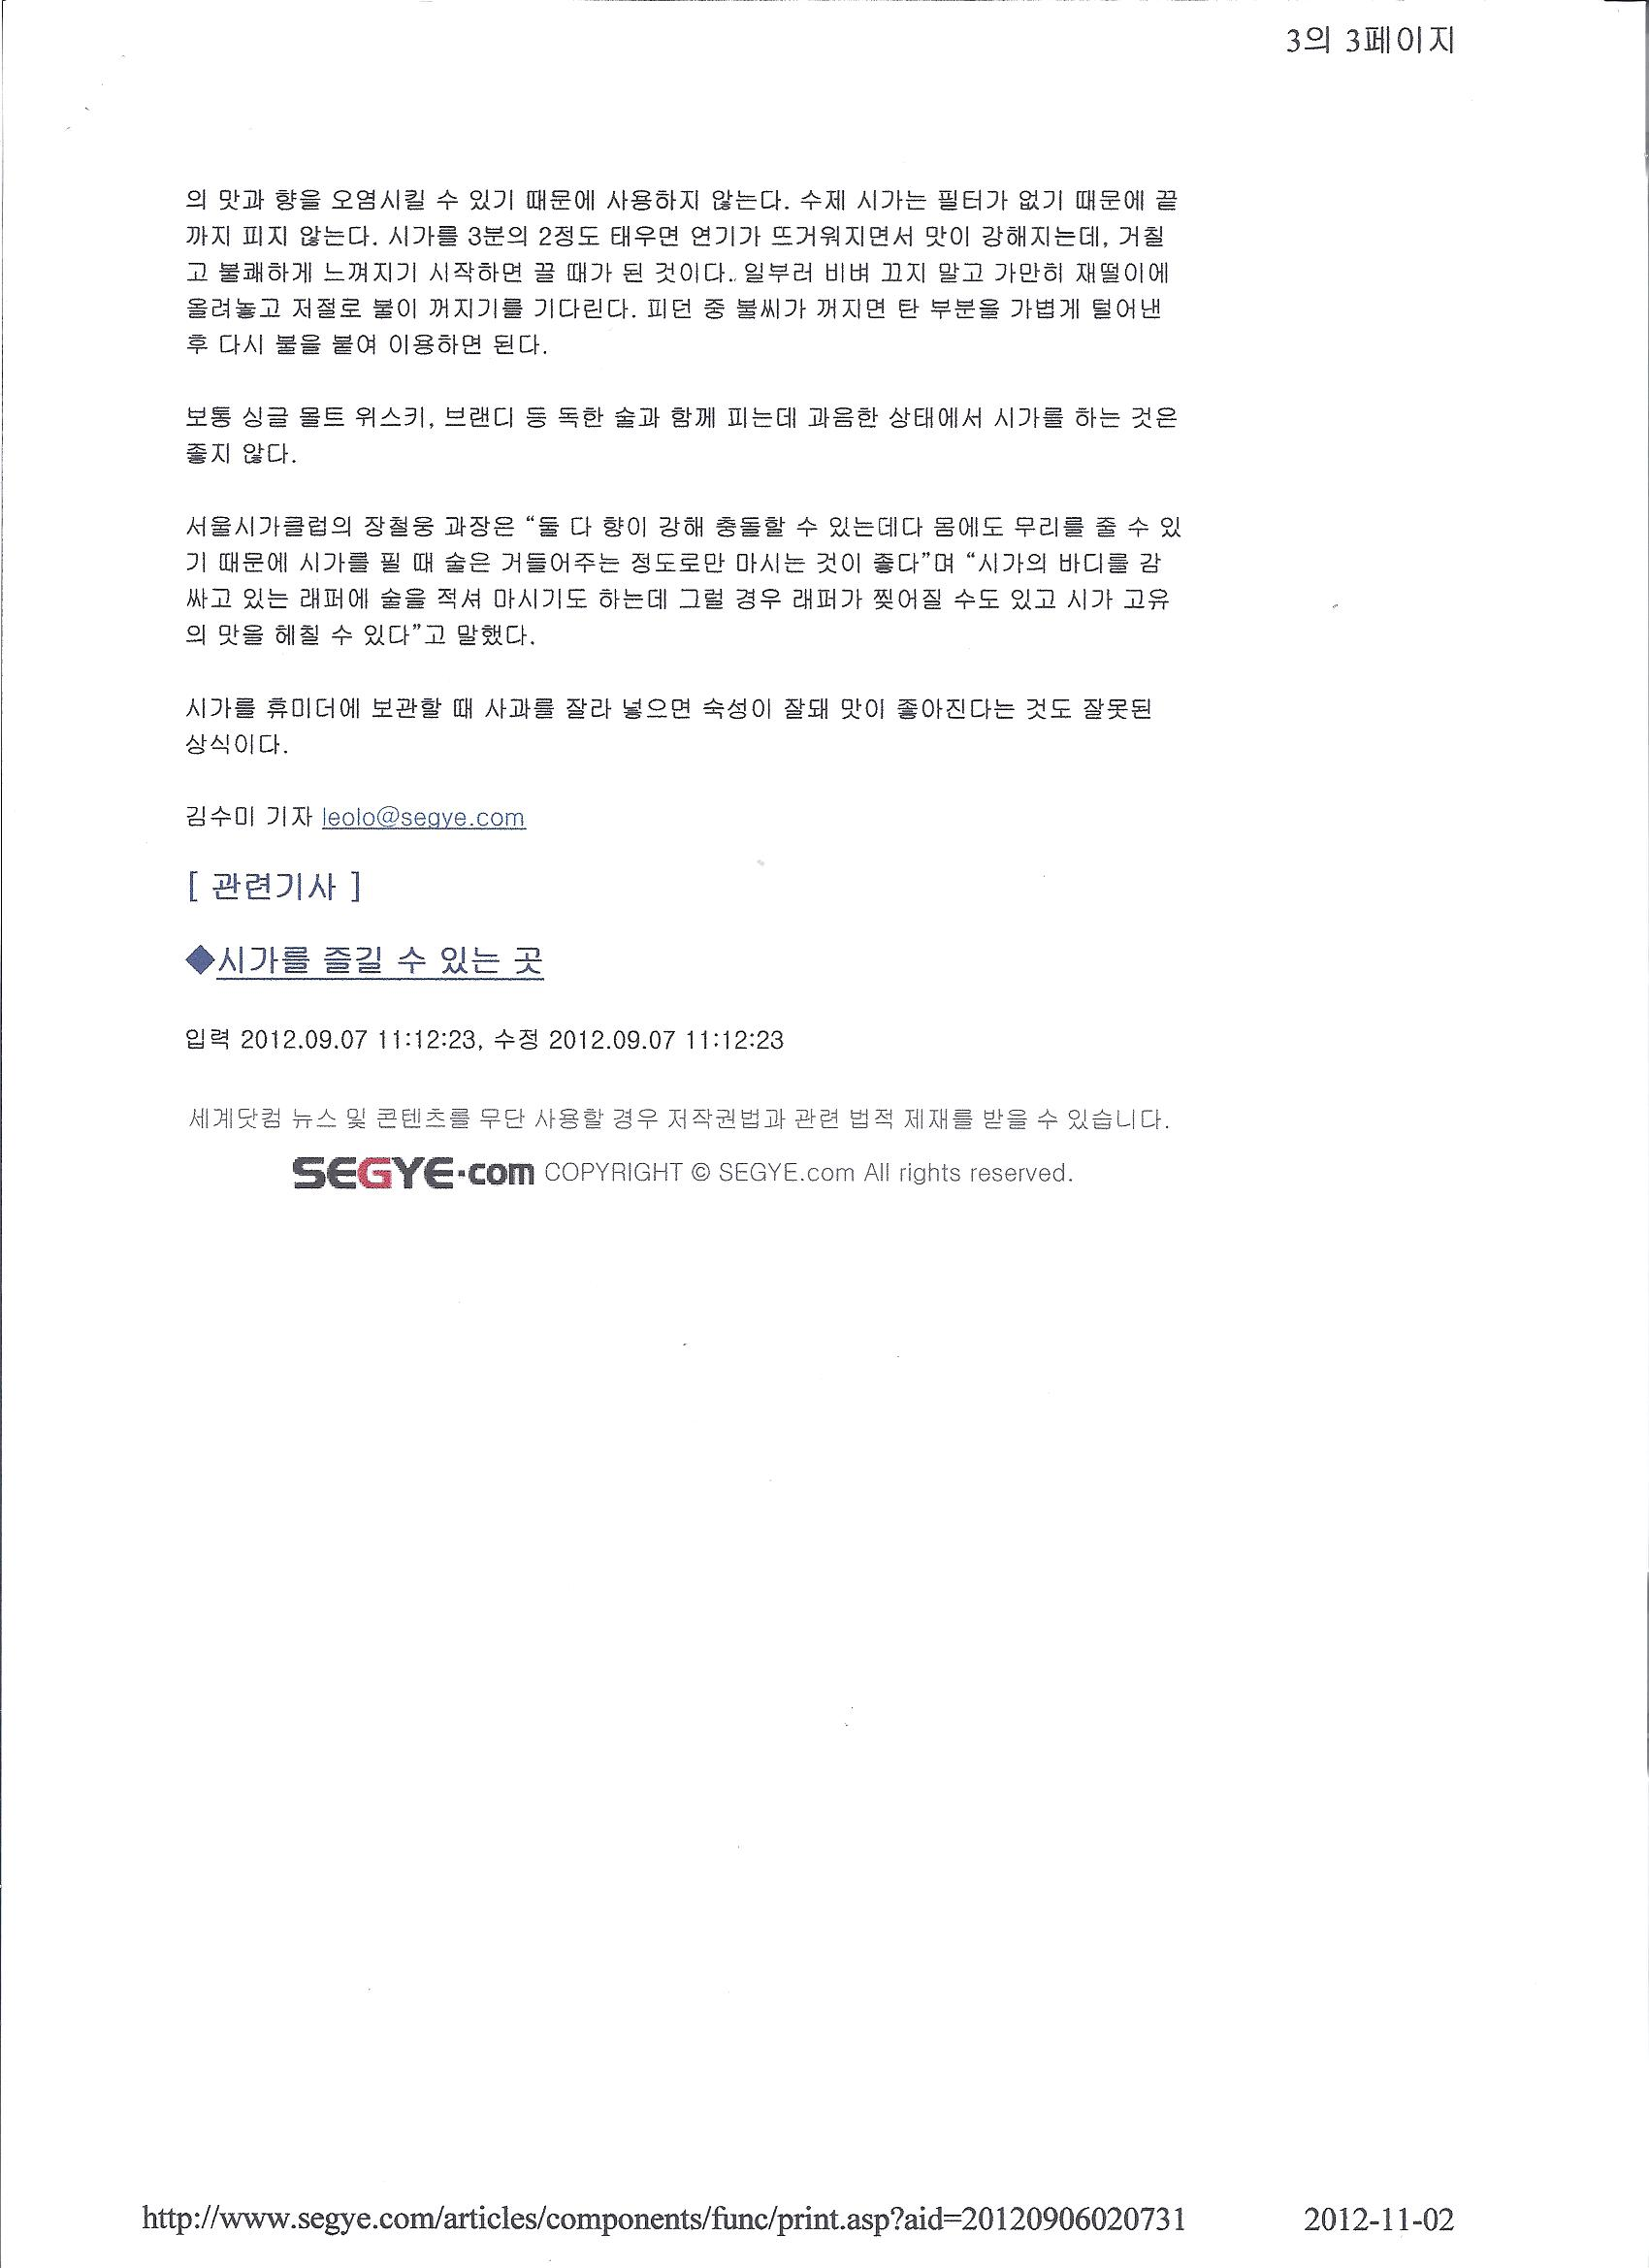 2012-9 Segye article 3.jpg